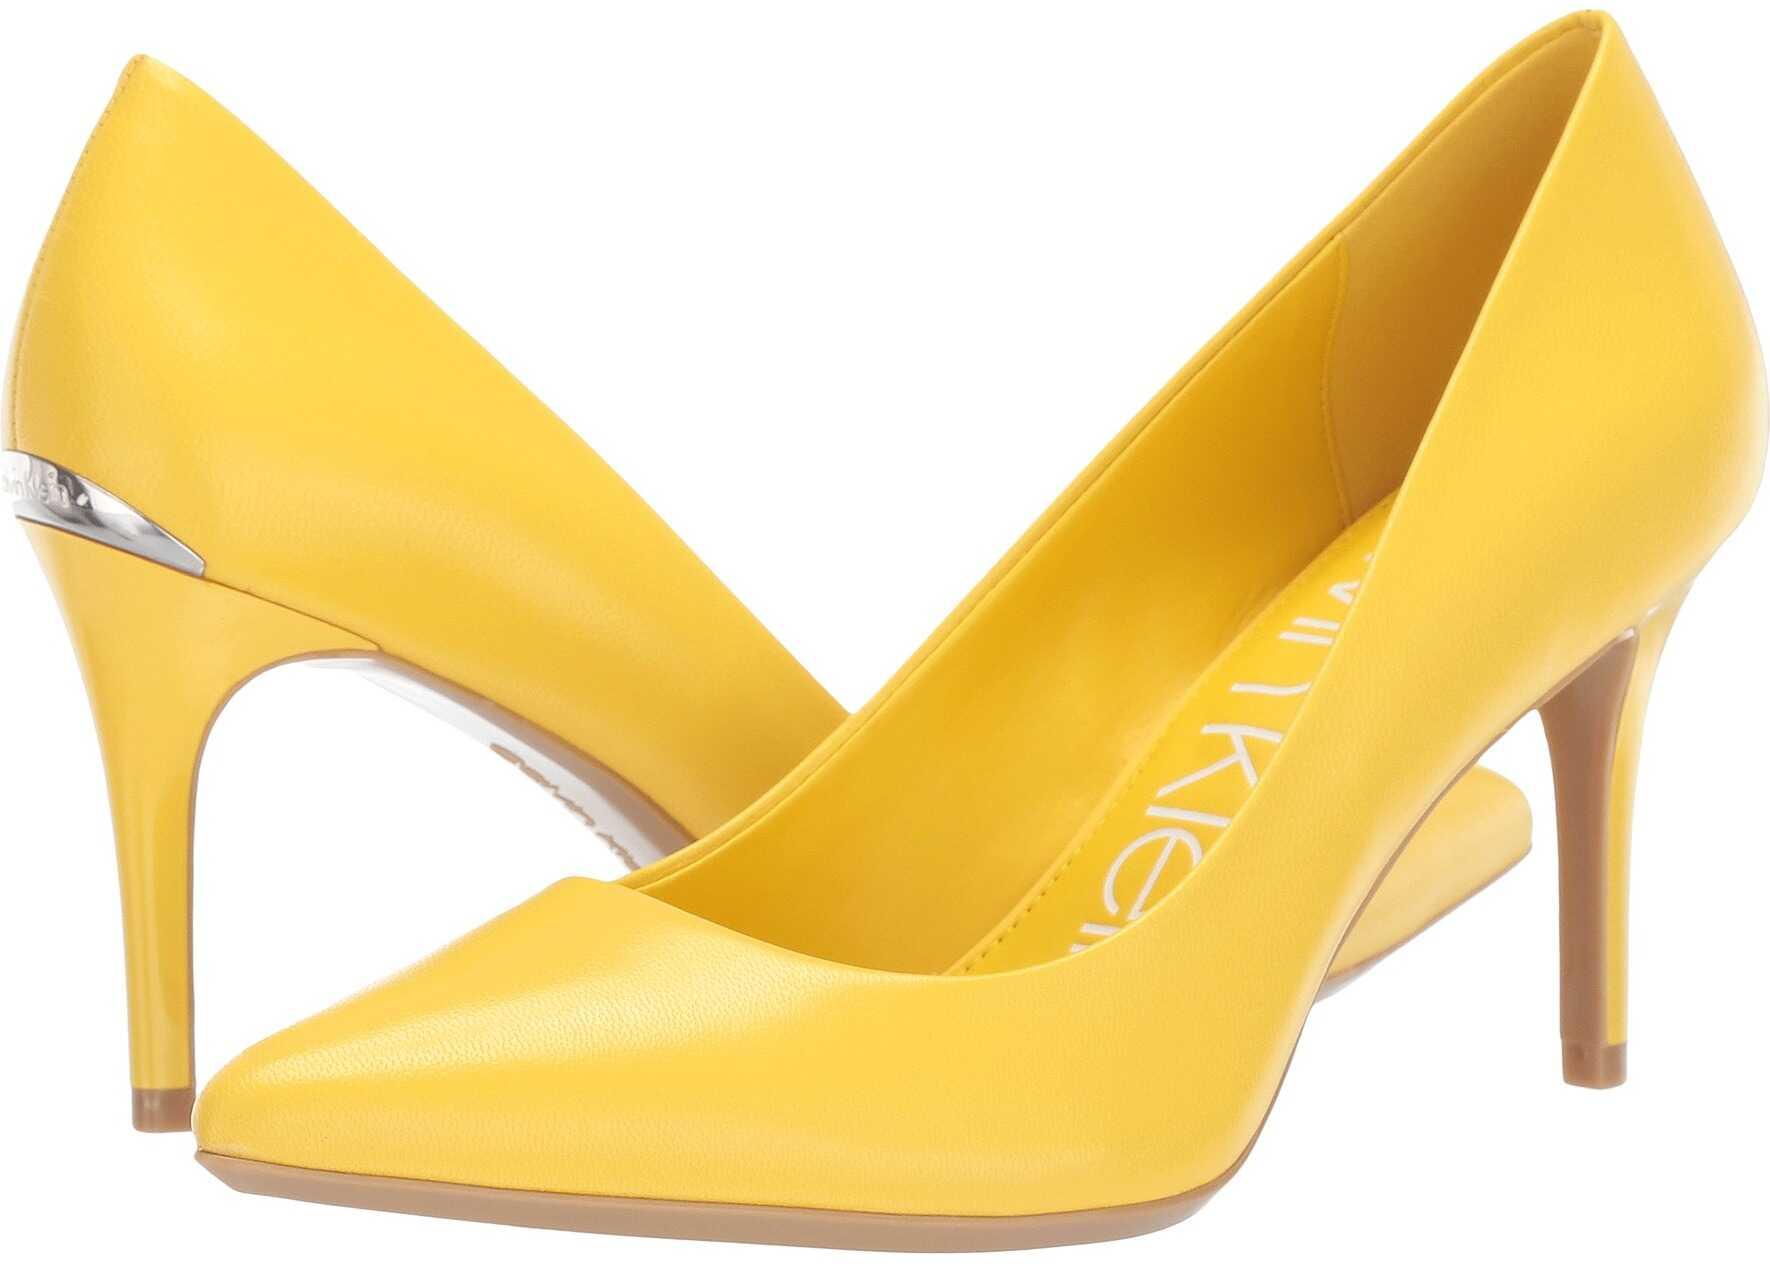 Calvin Klein Gayle Pump Lemon Leather